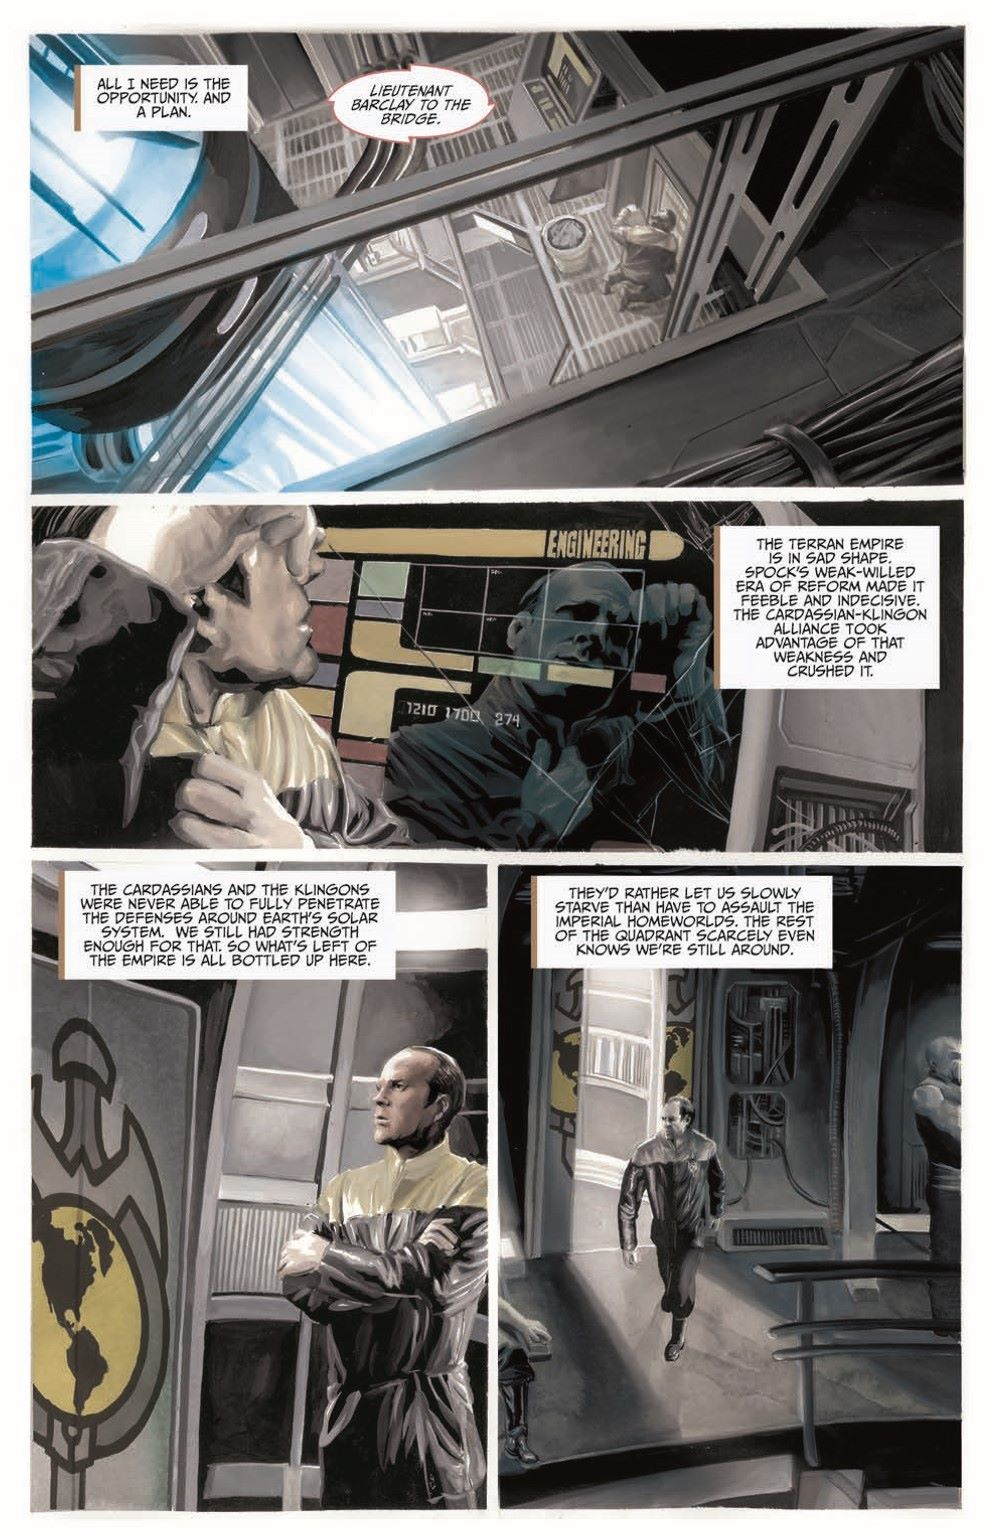 Star_Trek-TNG-MUC-pr-5 ComicList Previews: STAR TREK THE NEXT GENERATION MIRROR UNIVERSE COLLECTION TP